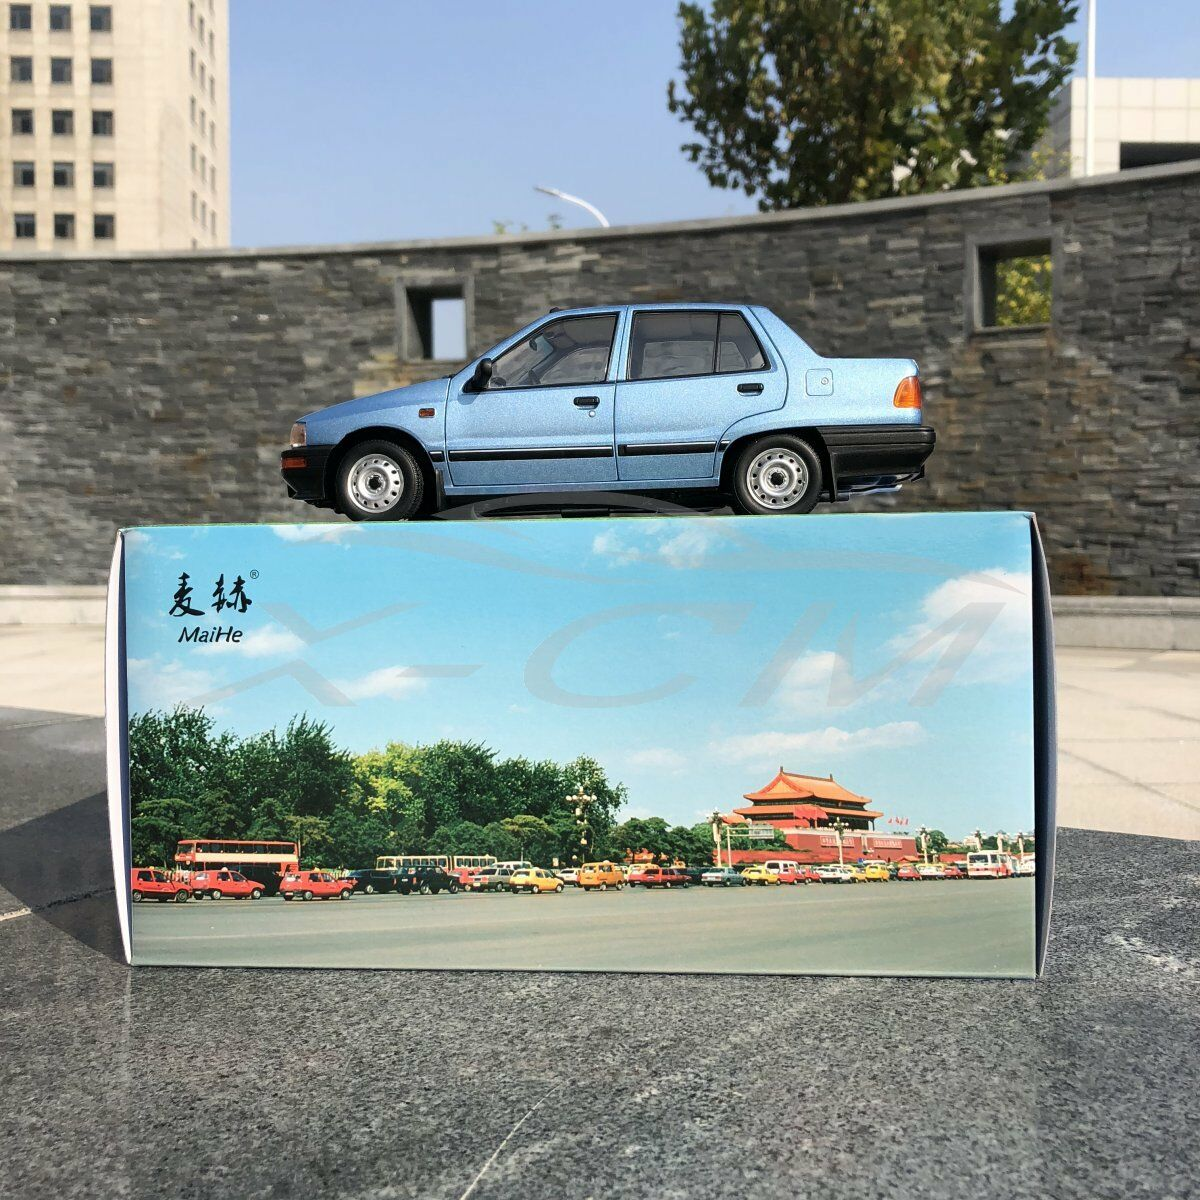 nessun minimo modellolo modellolo modellolo AUTO DIECAST yiqi cinese Tianjin xiali TJ7100 Berlina 1 18 (blu) + REGALO  acquista marca